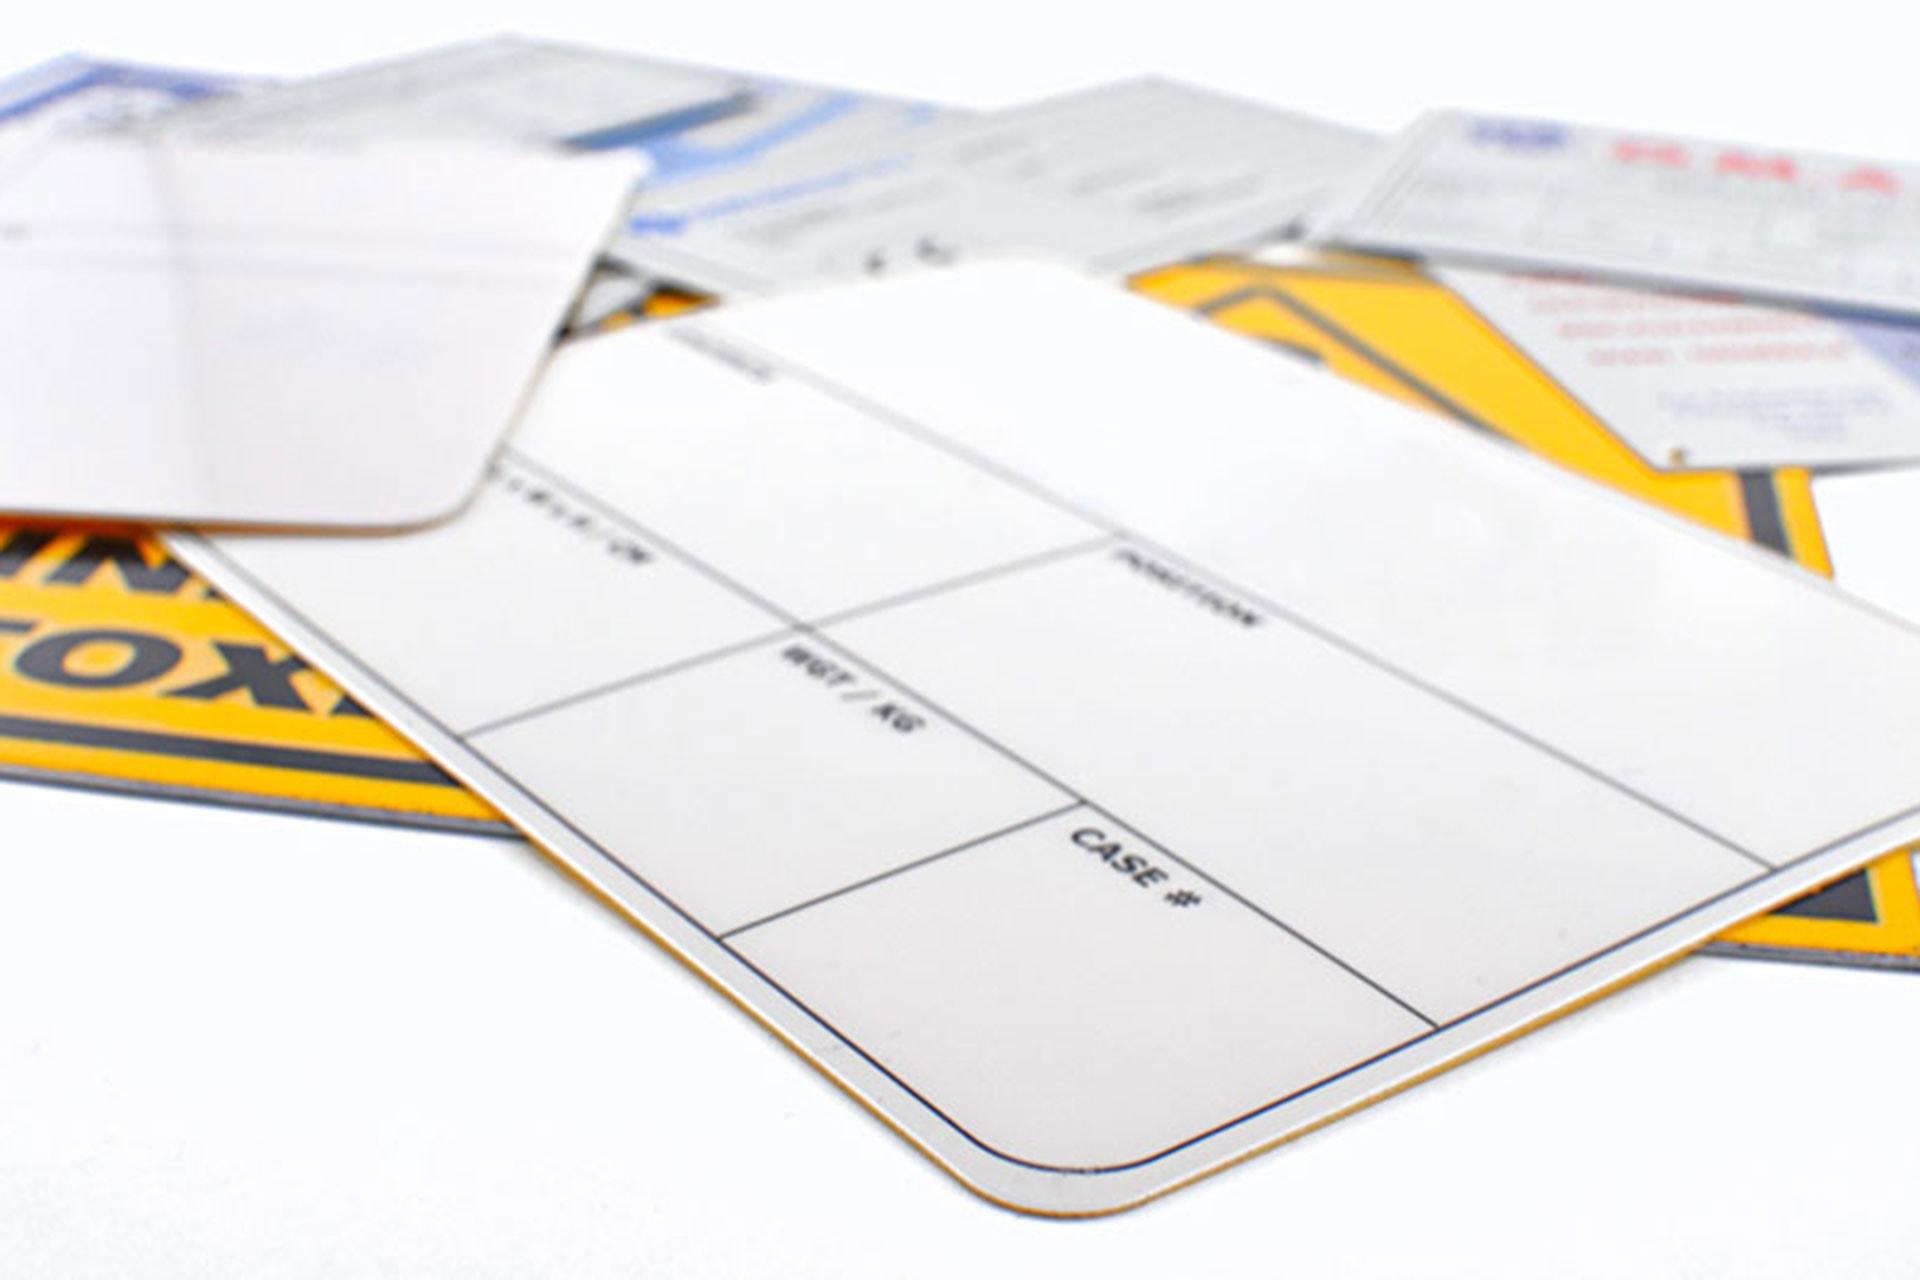 Targhe in PVC con biadesivo telato serigrafate